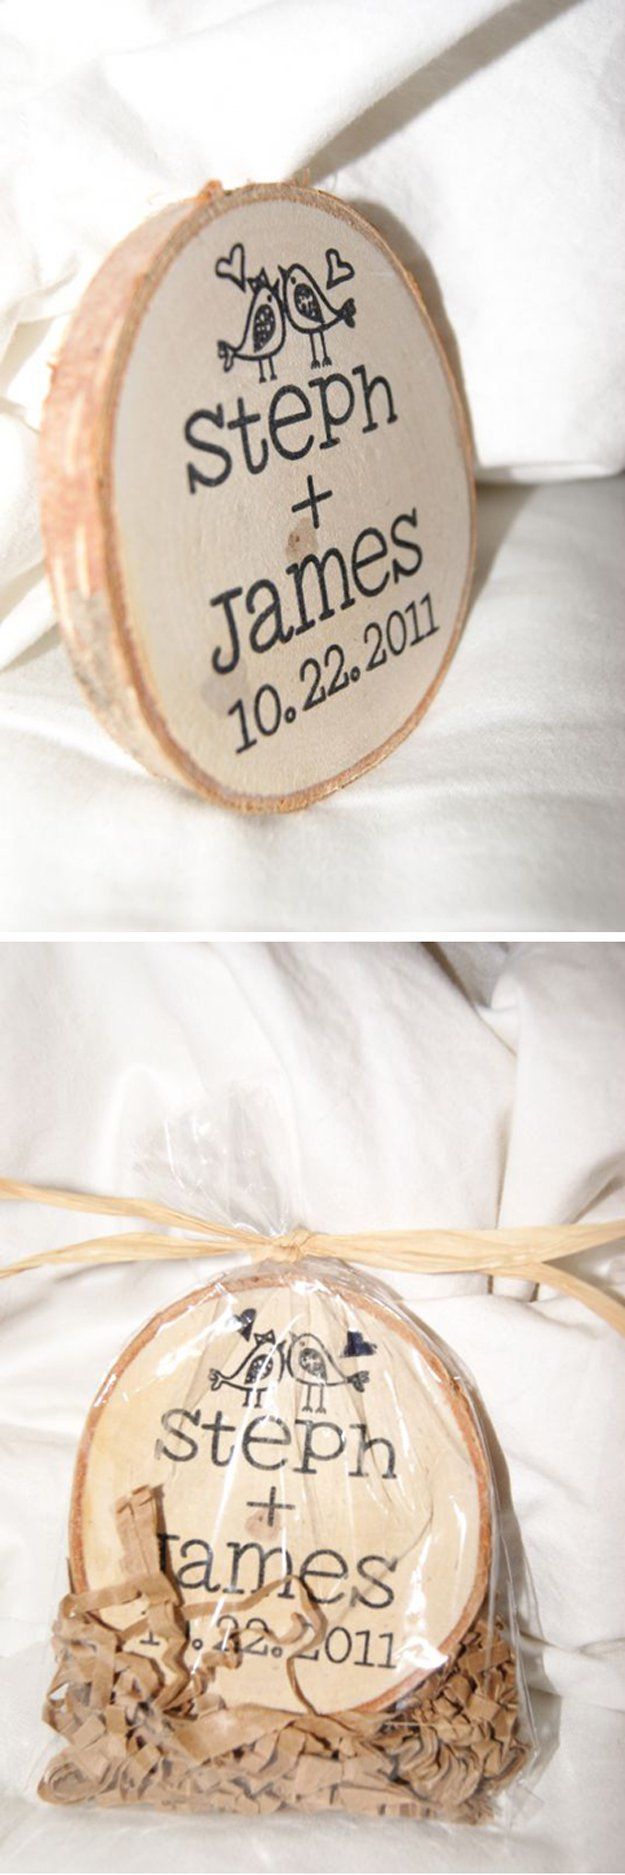 24 DIY Wedding Favor Ideas | DIY wedding, Magnets and Favors